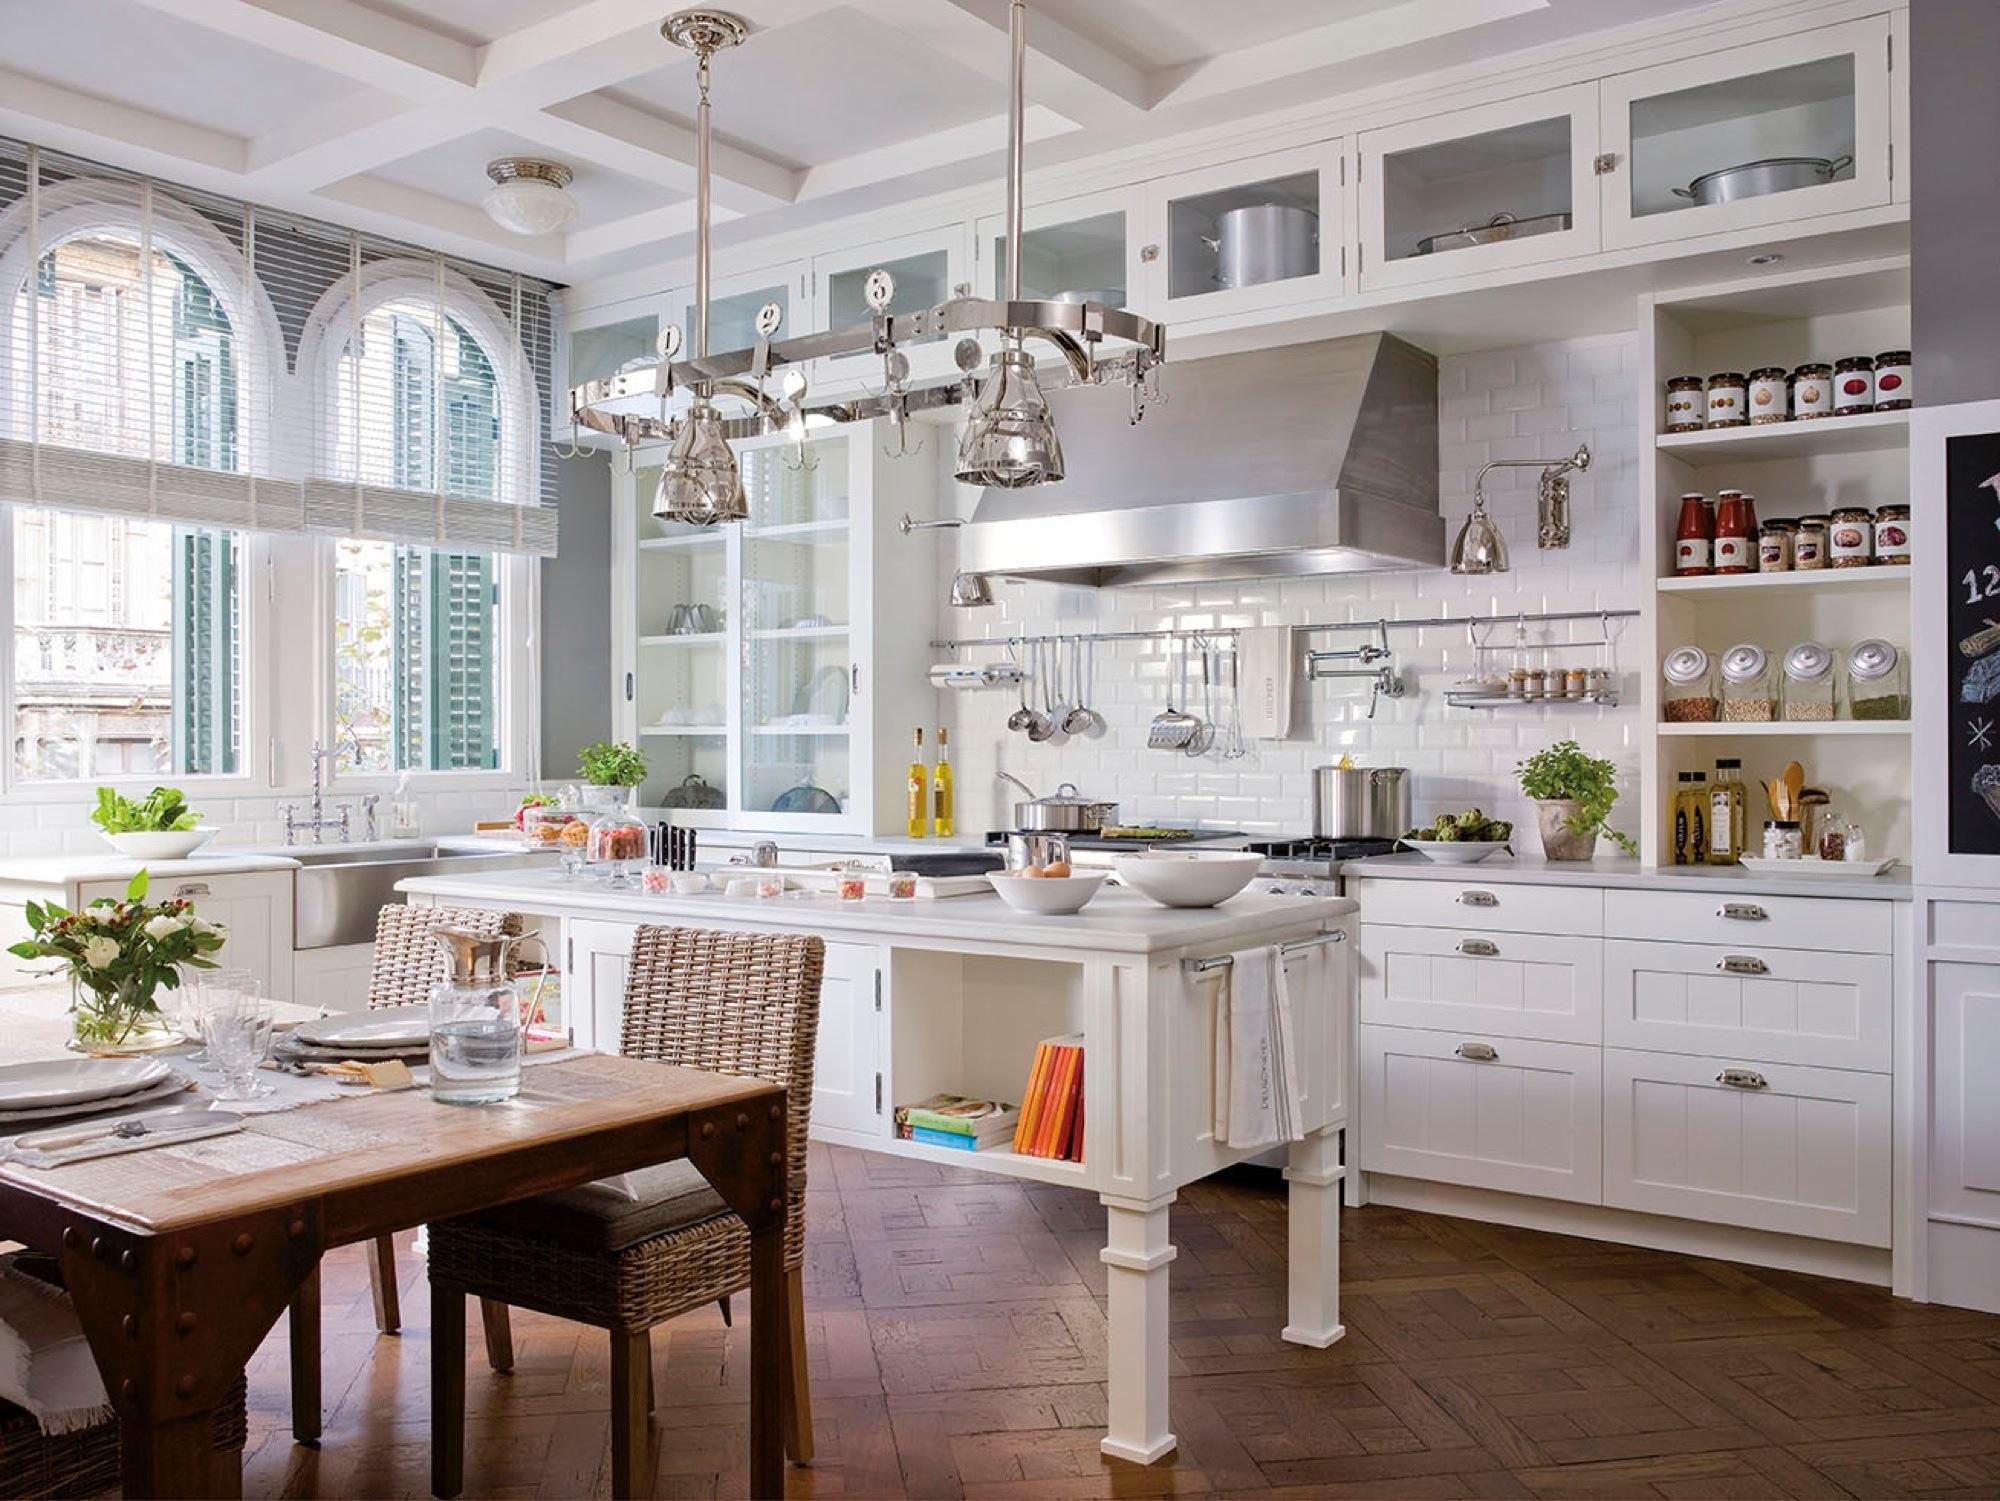 Una amplia cocina 39 american style 39 - Cucina americana ...